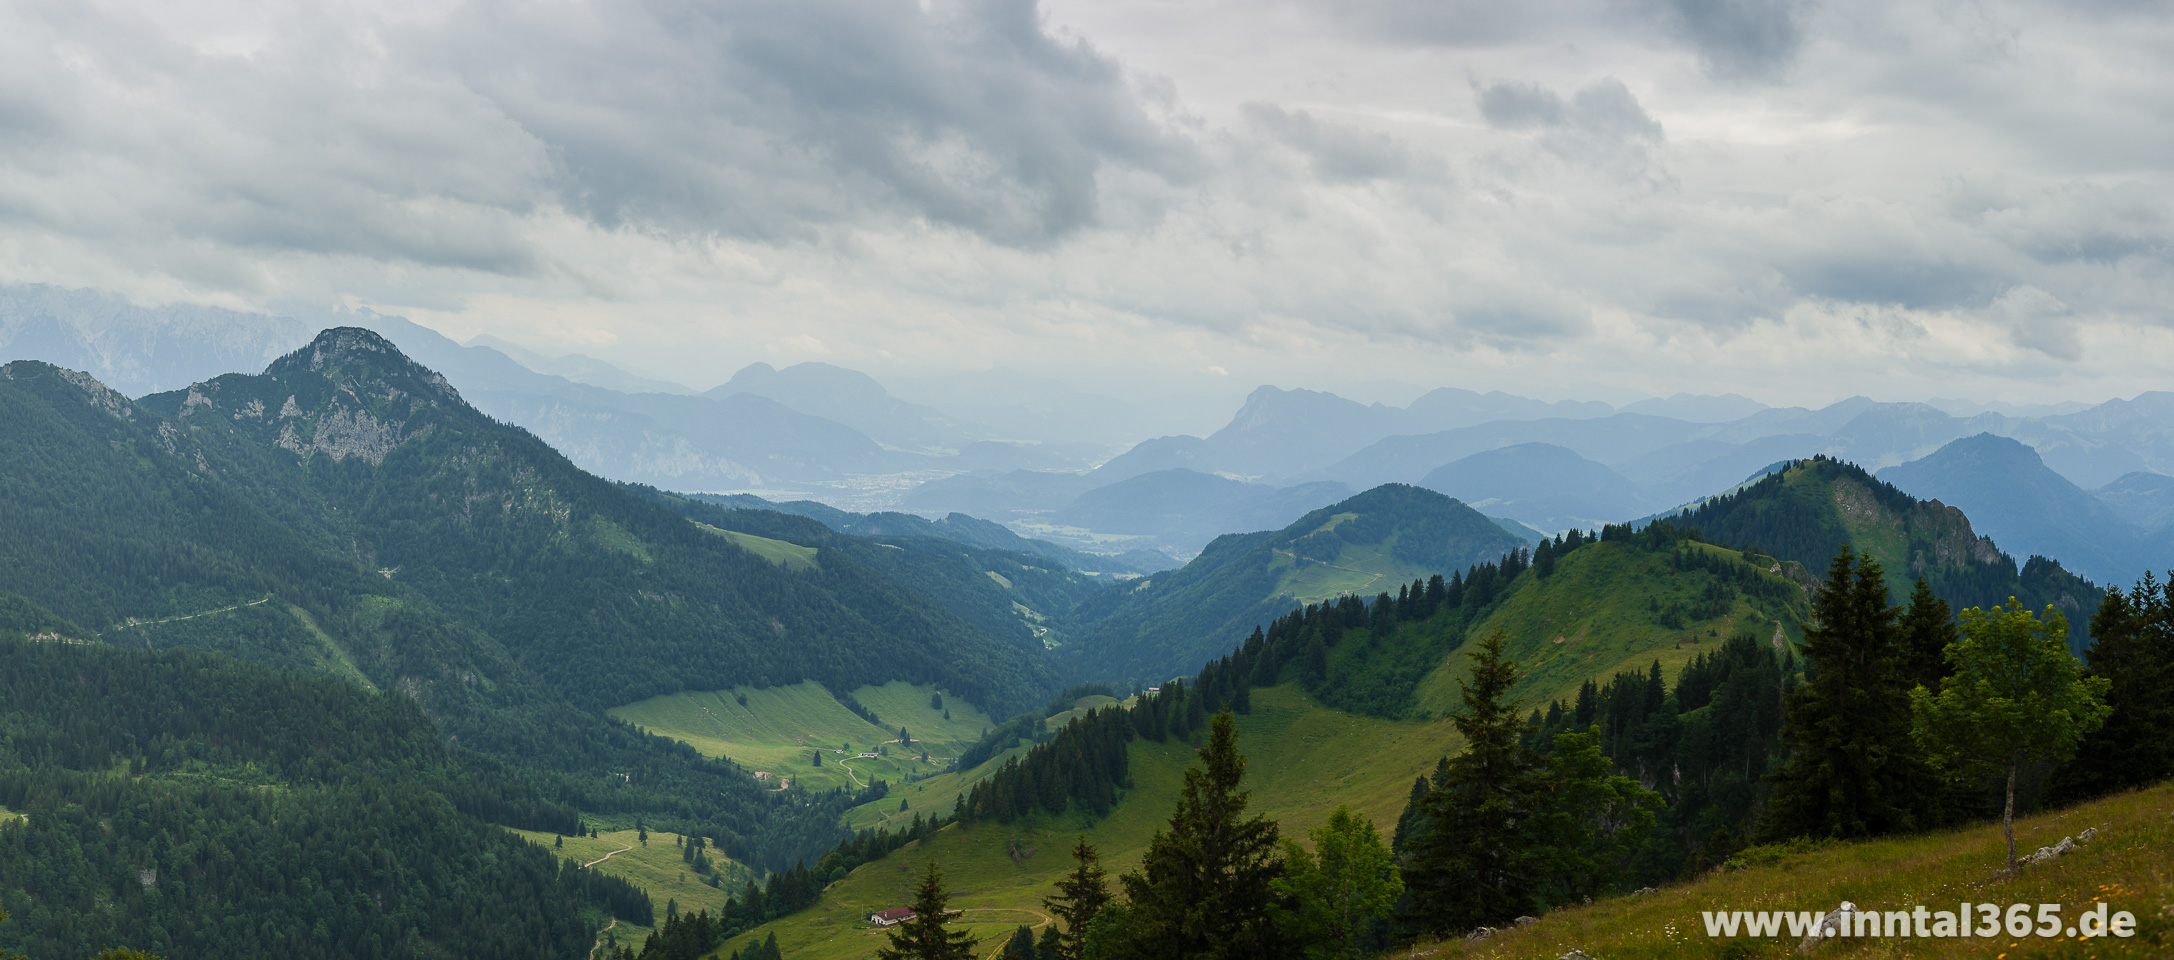 25.07.2015 - Hochrieshütte Blick Richtung Süd/West